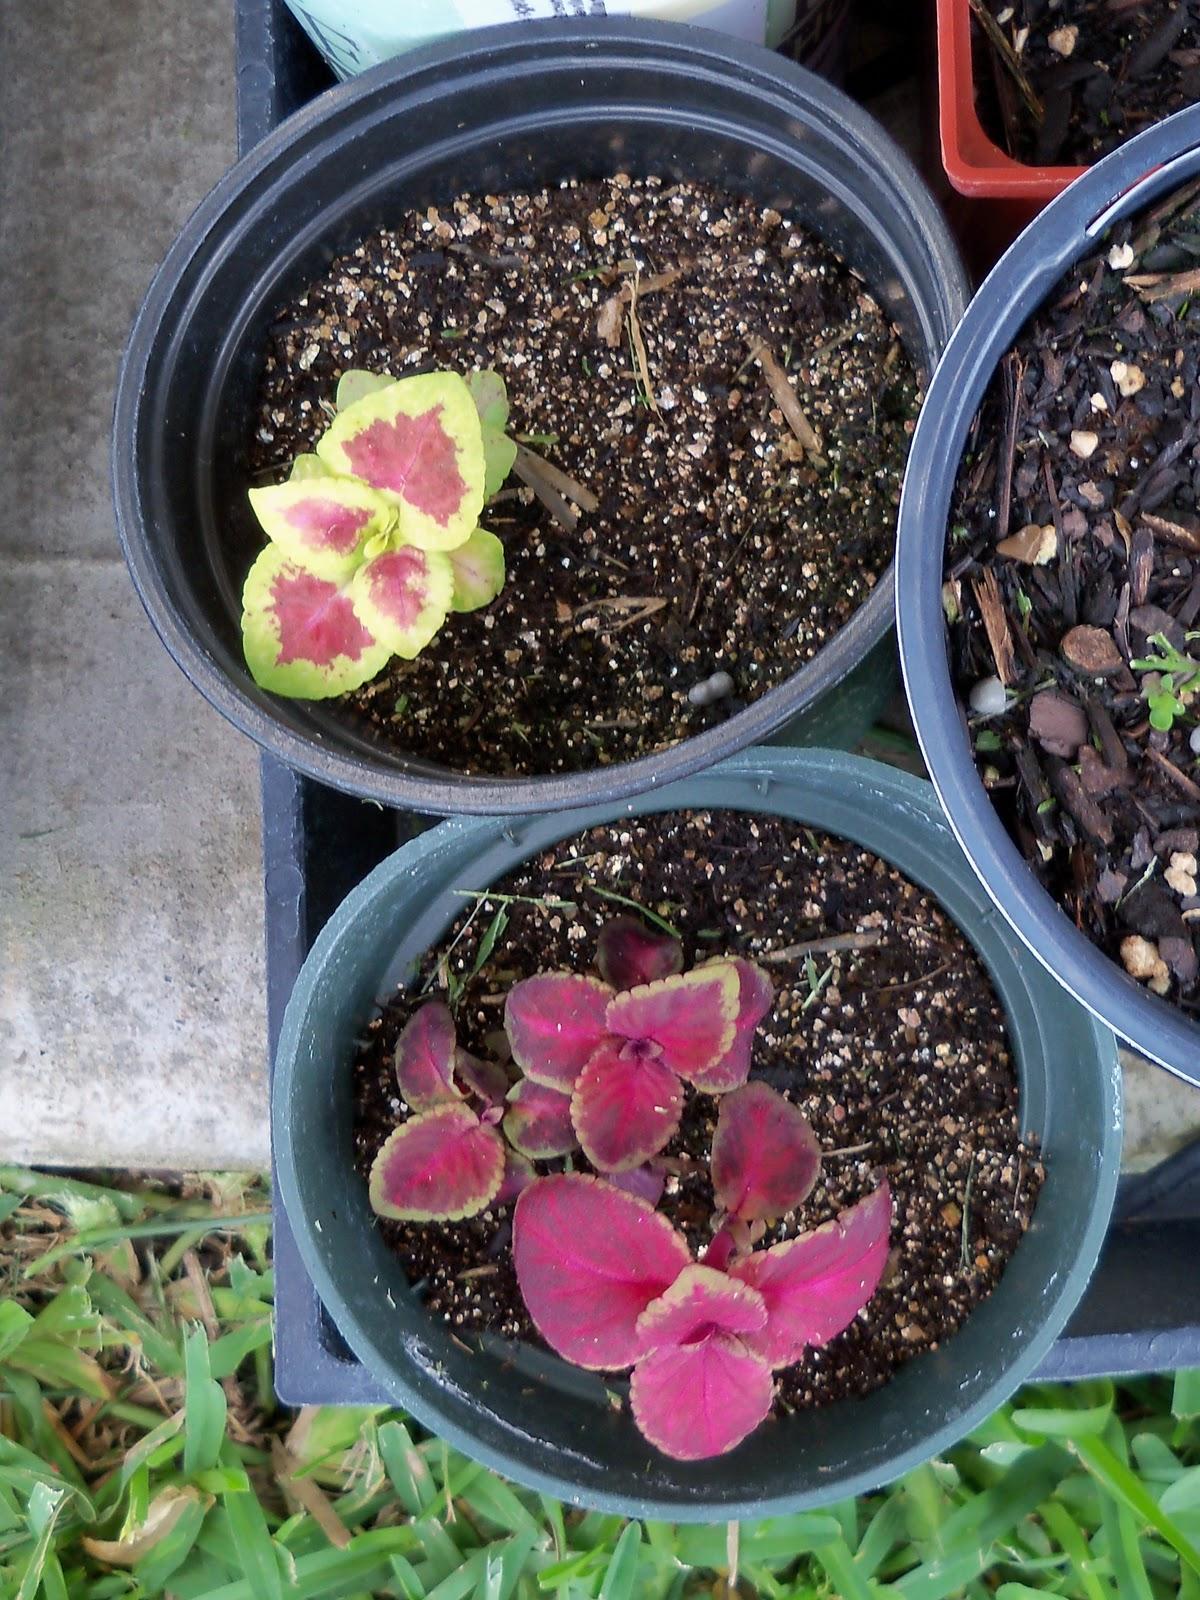 Gardening 2010, Part Two - 101_2533.JPG